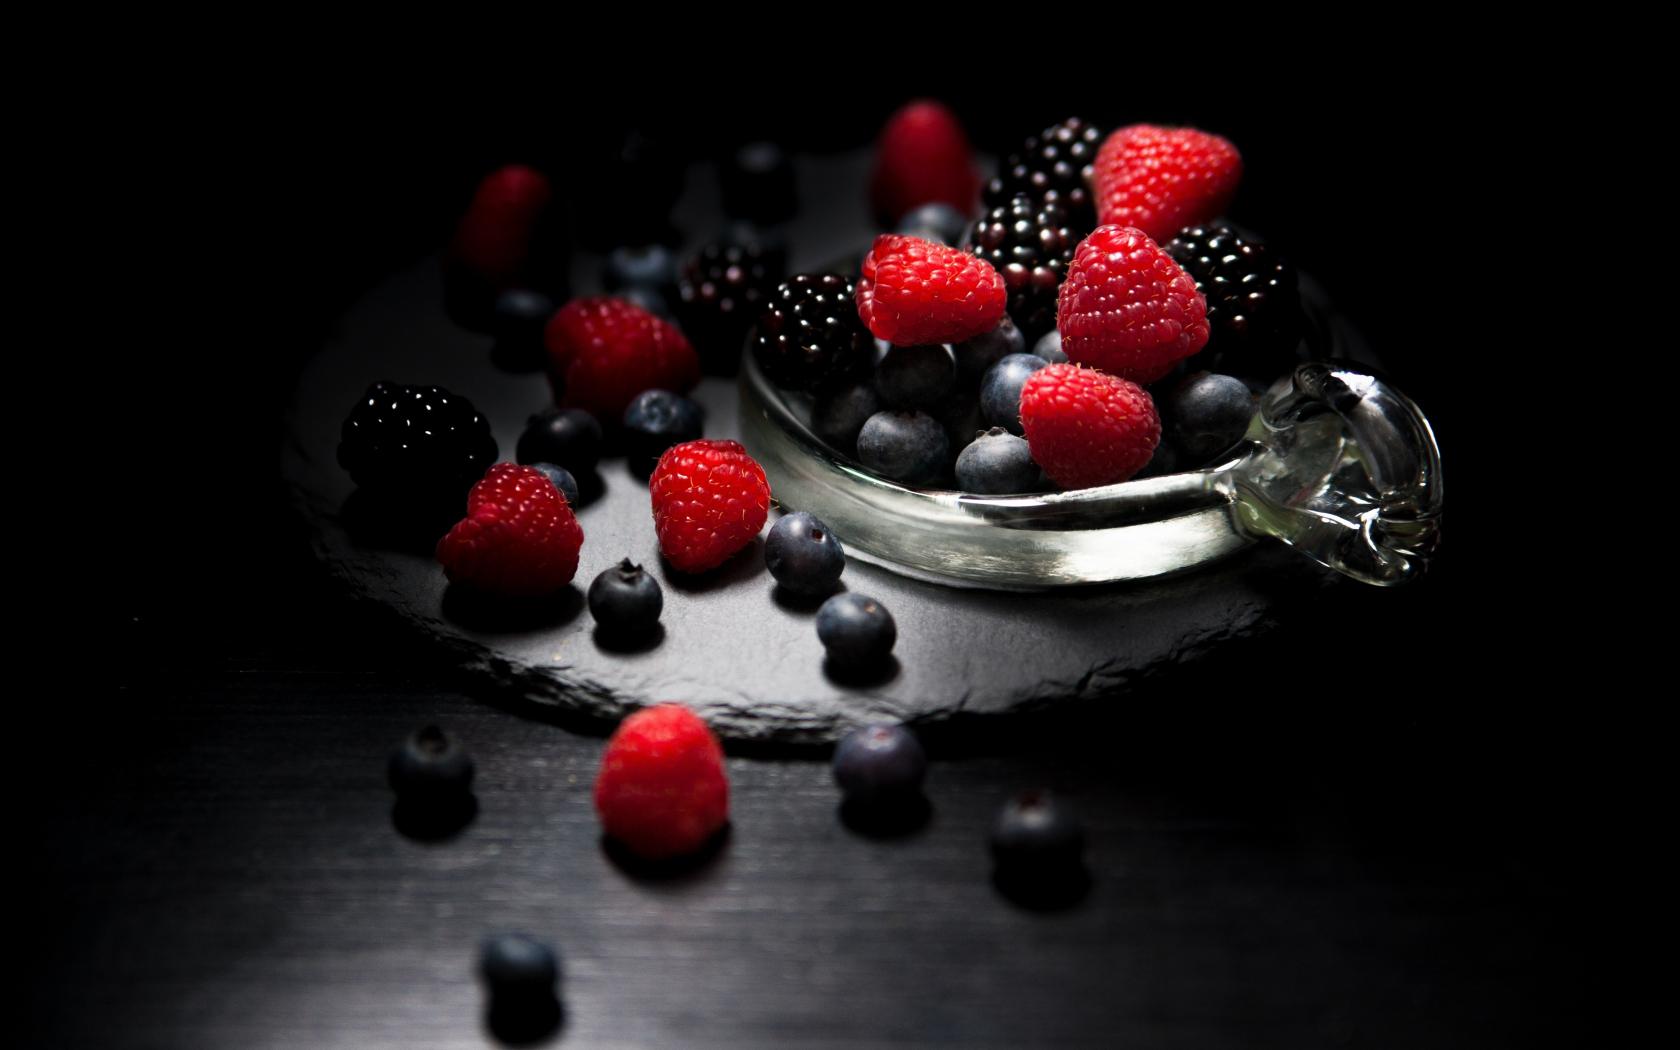 1680x1050 wallpaper Dark mood, food, fruits, blueberry, raspberry, blackberry, 4k